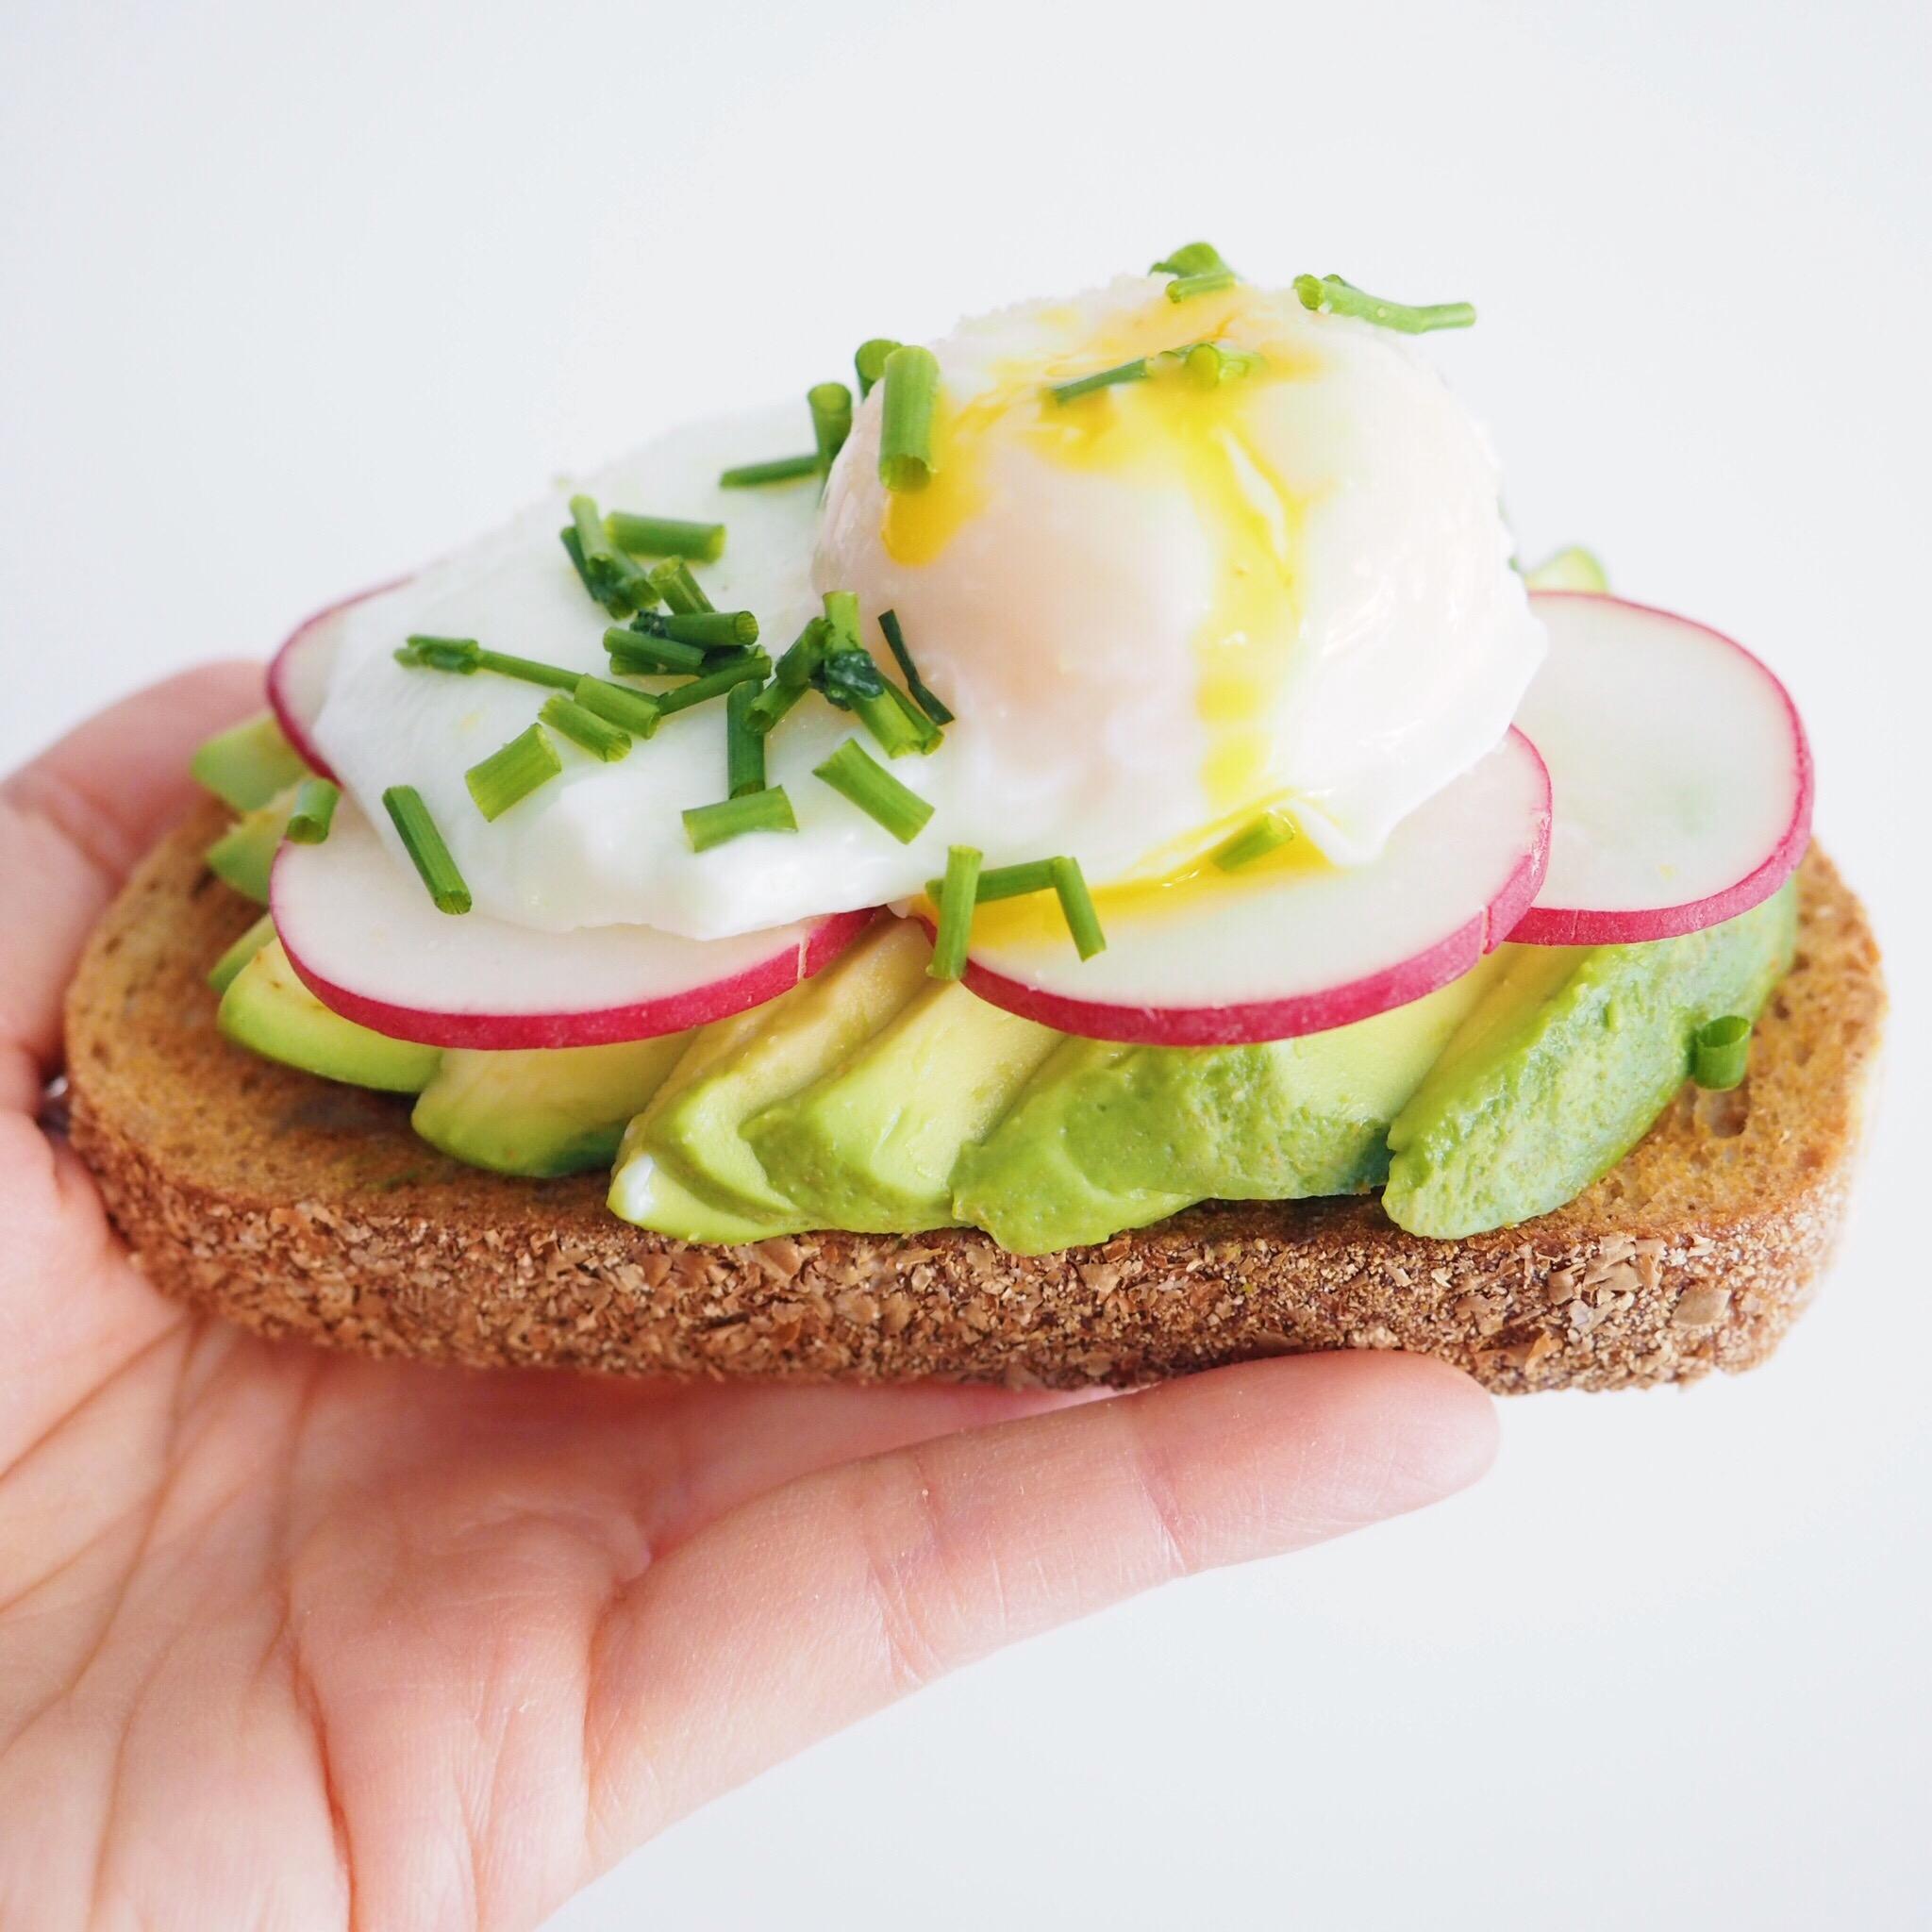 Avo Egg Toast with Radish.JPG